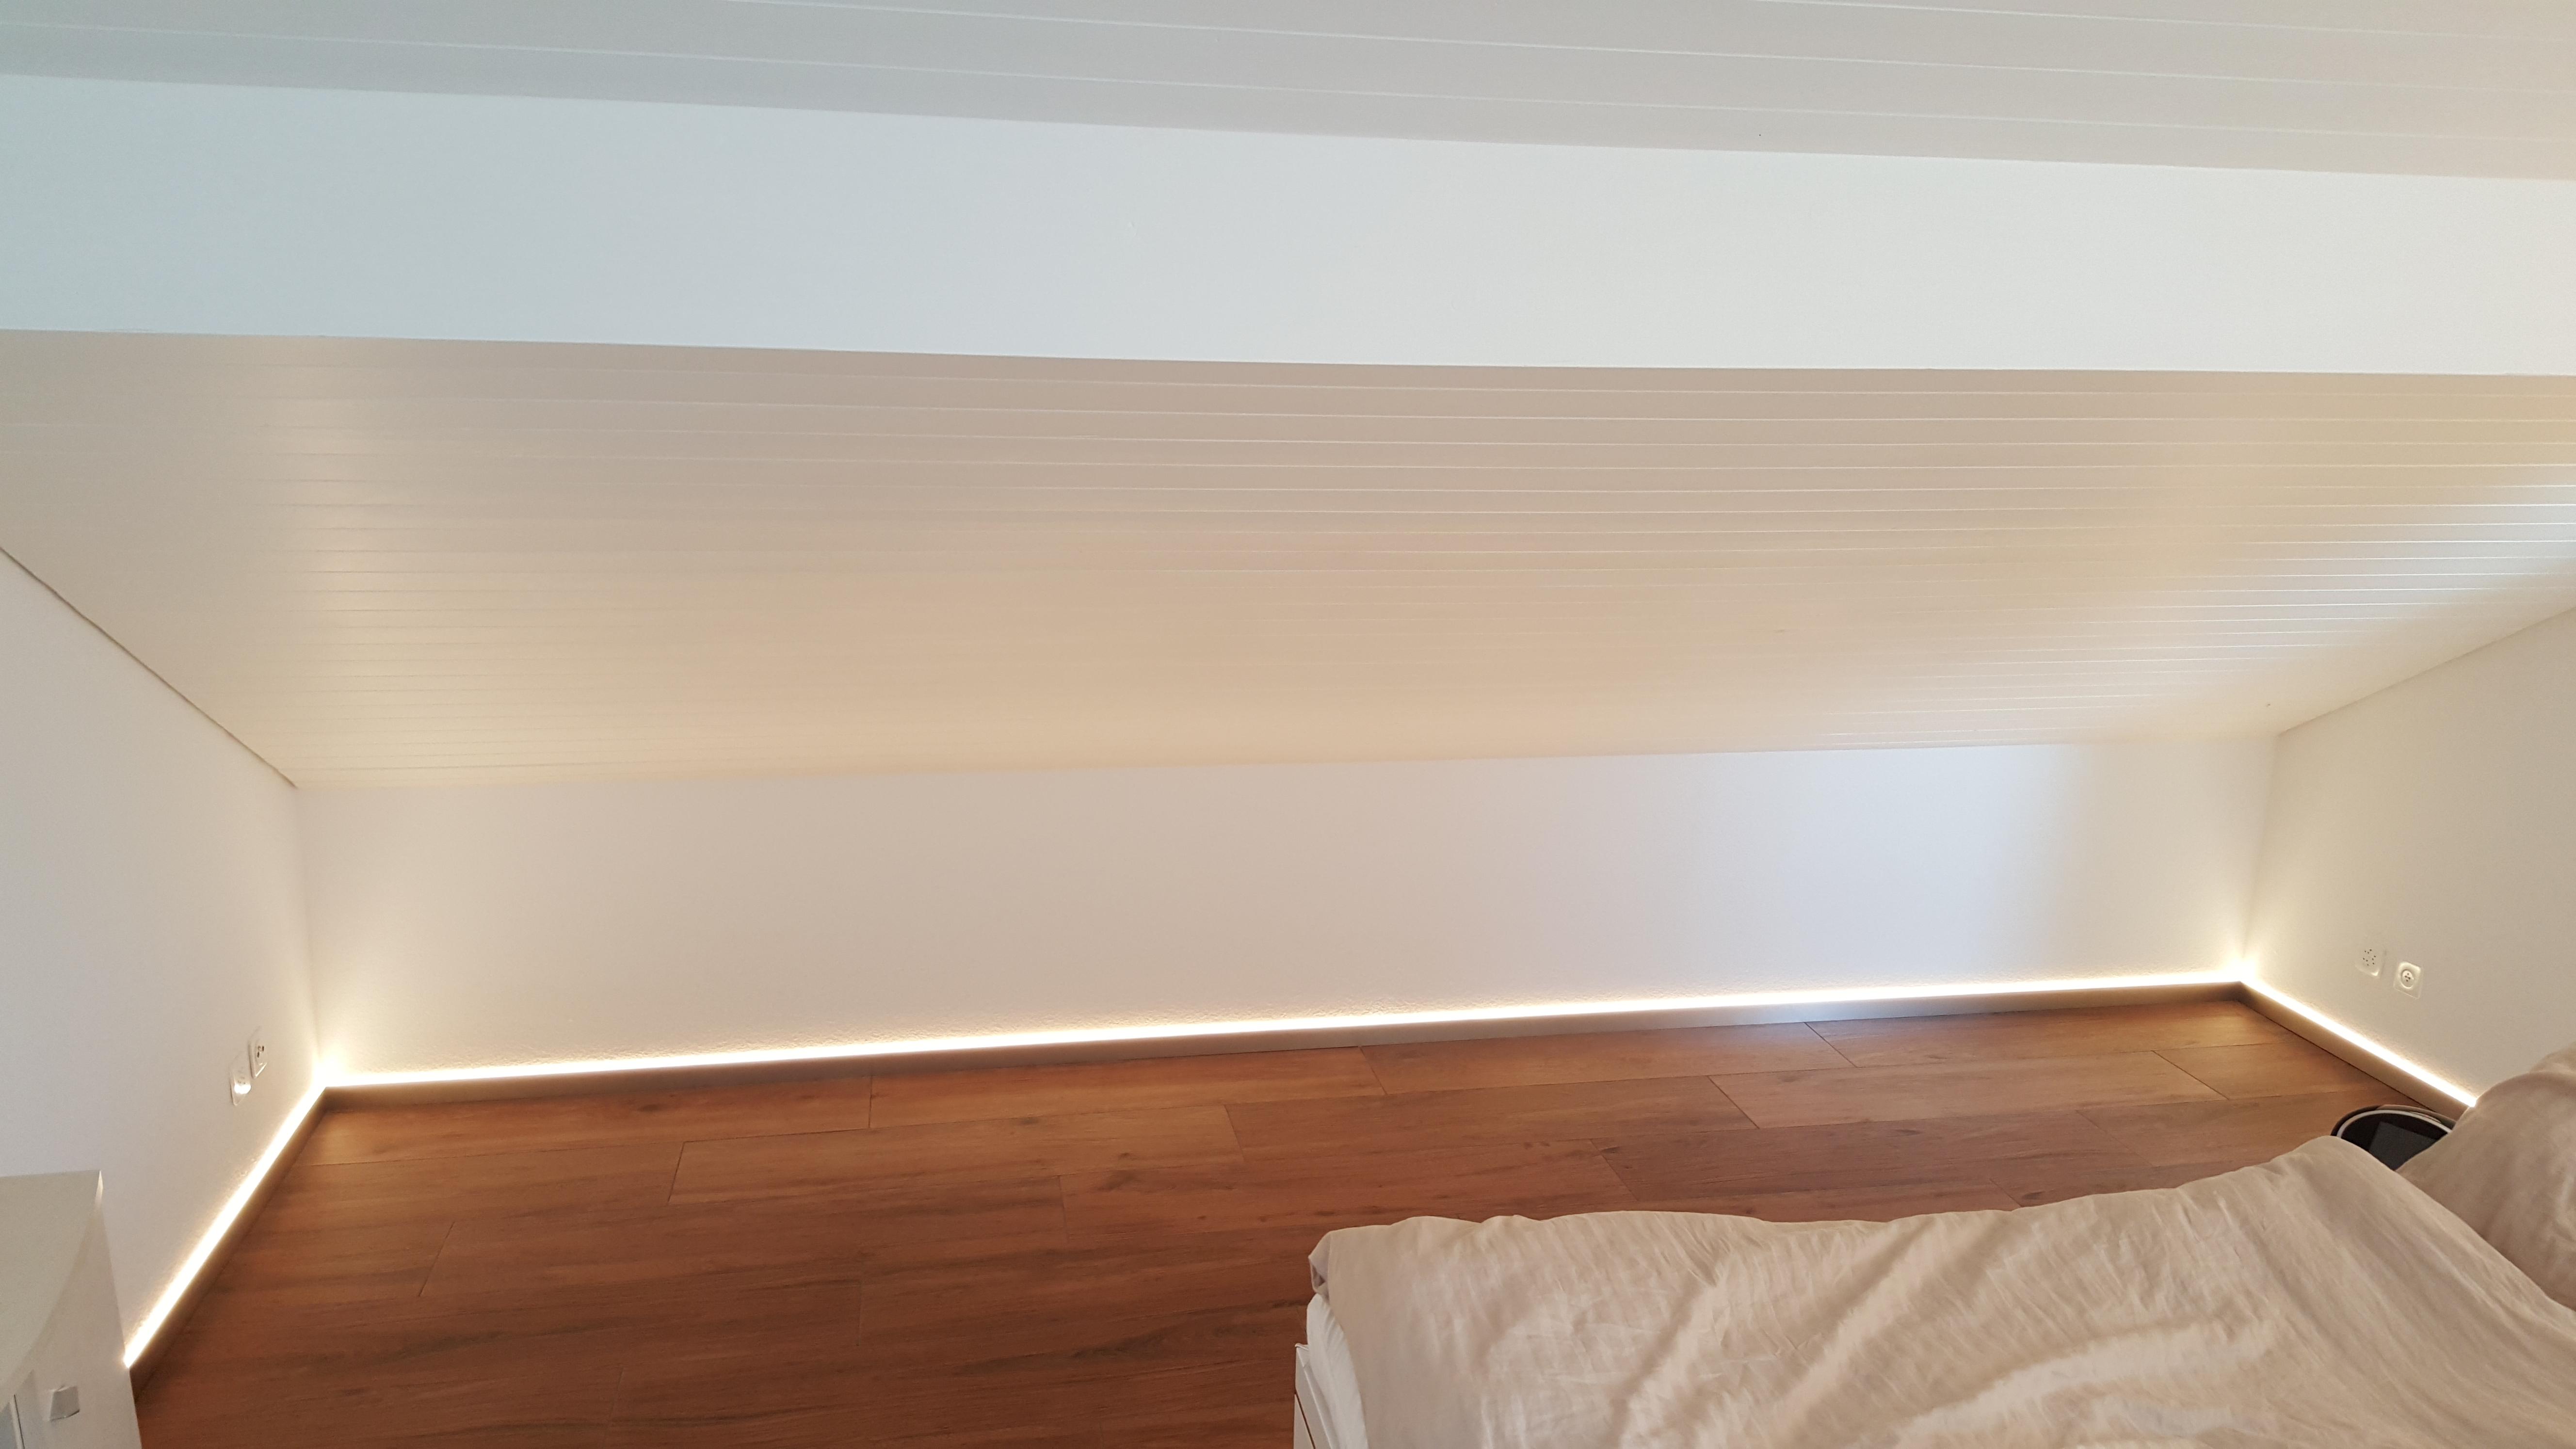 Alu Nox LED indirekt 60/12 mm